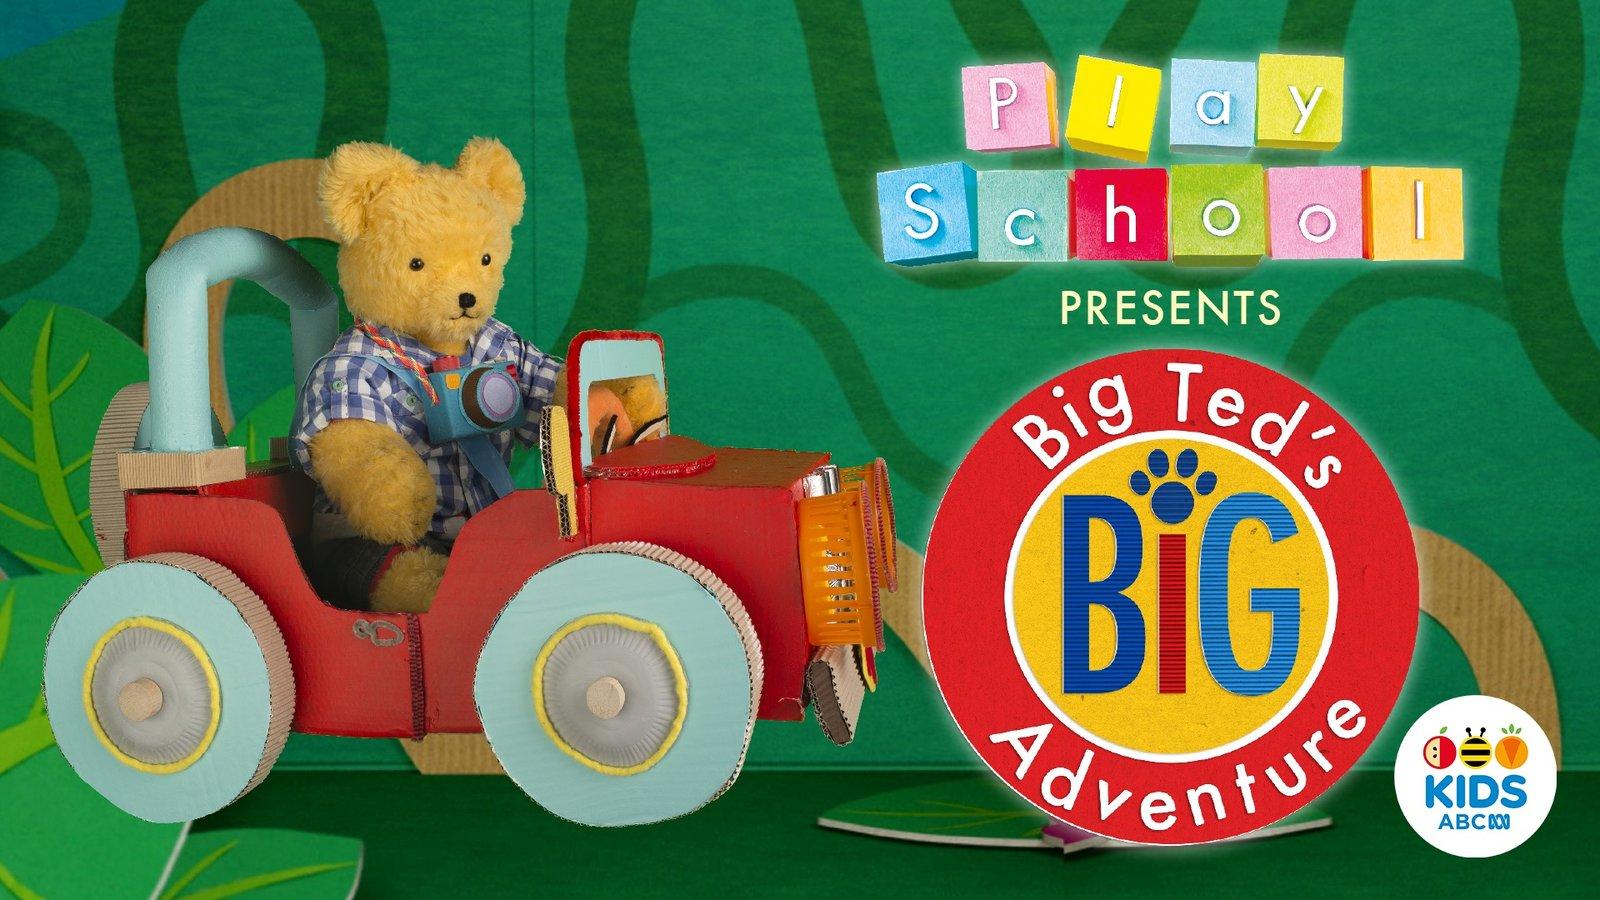 Big Ted's Big Adventure